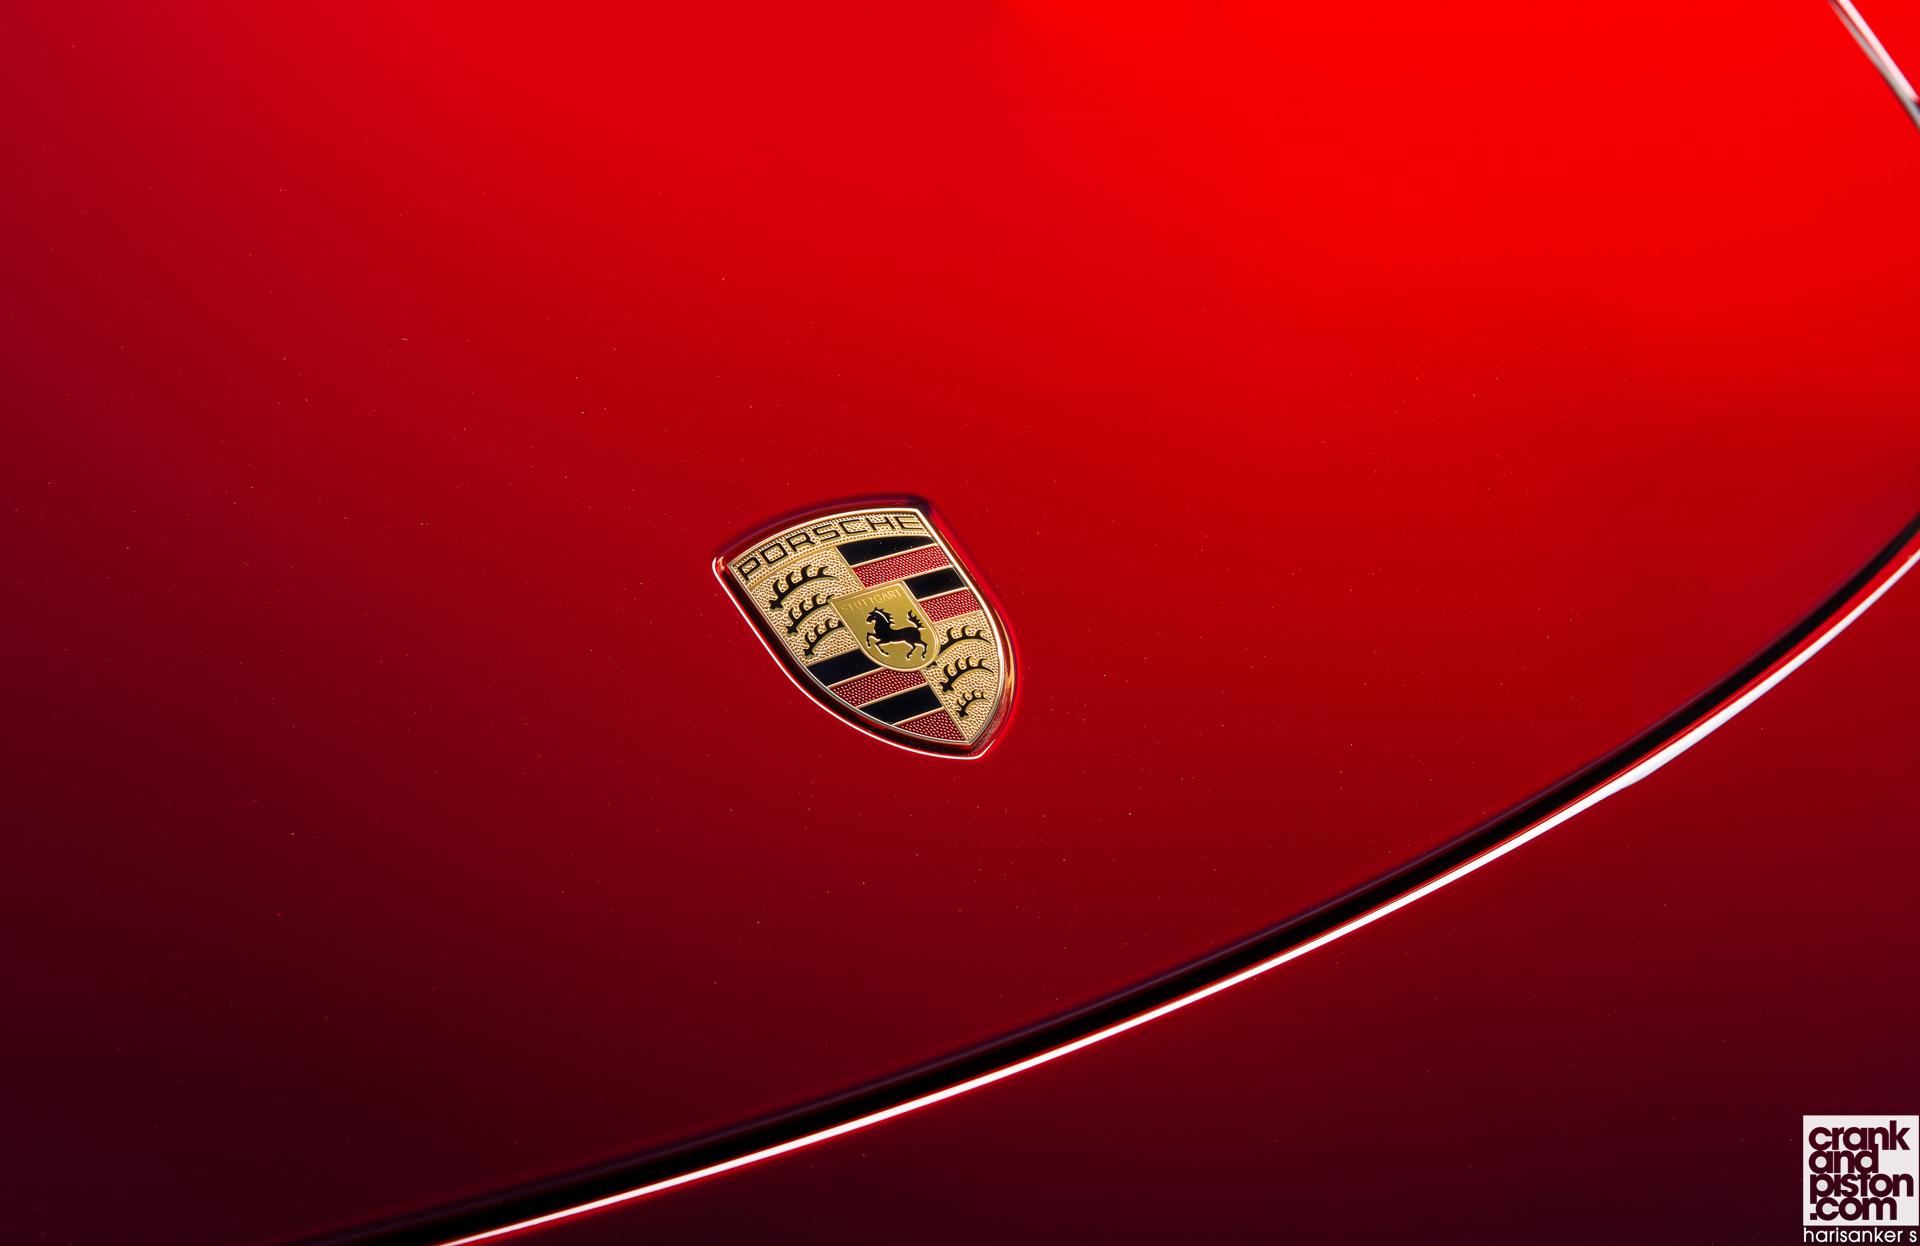 Porsche Carrera GTS crankandpiston wallpaper-6